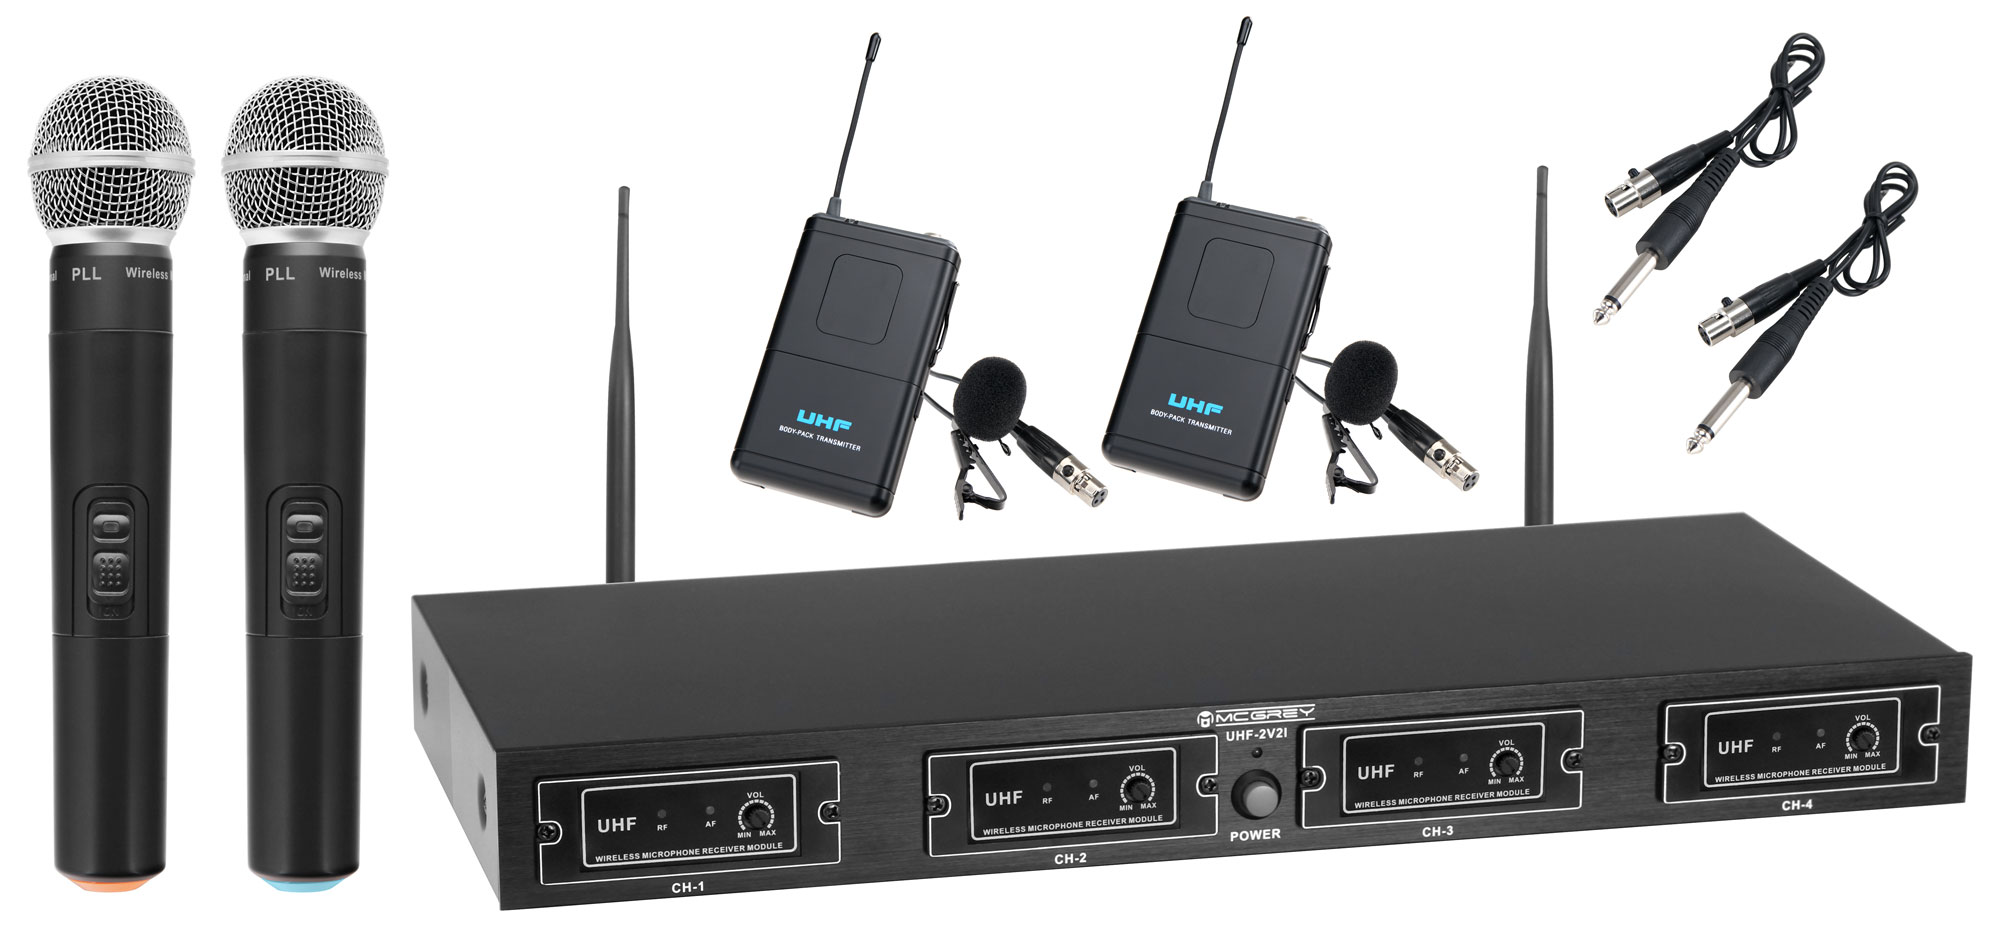 Mikrofone - McGrey UHF 2V2I Quad Funkmikrofonset mit 2x Handmikrofon und 2x Lavaliermikrofon 50m Retoure (Zustand wie neu) - Onlineshop Musikhaus Kirstein